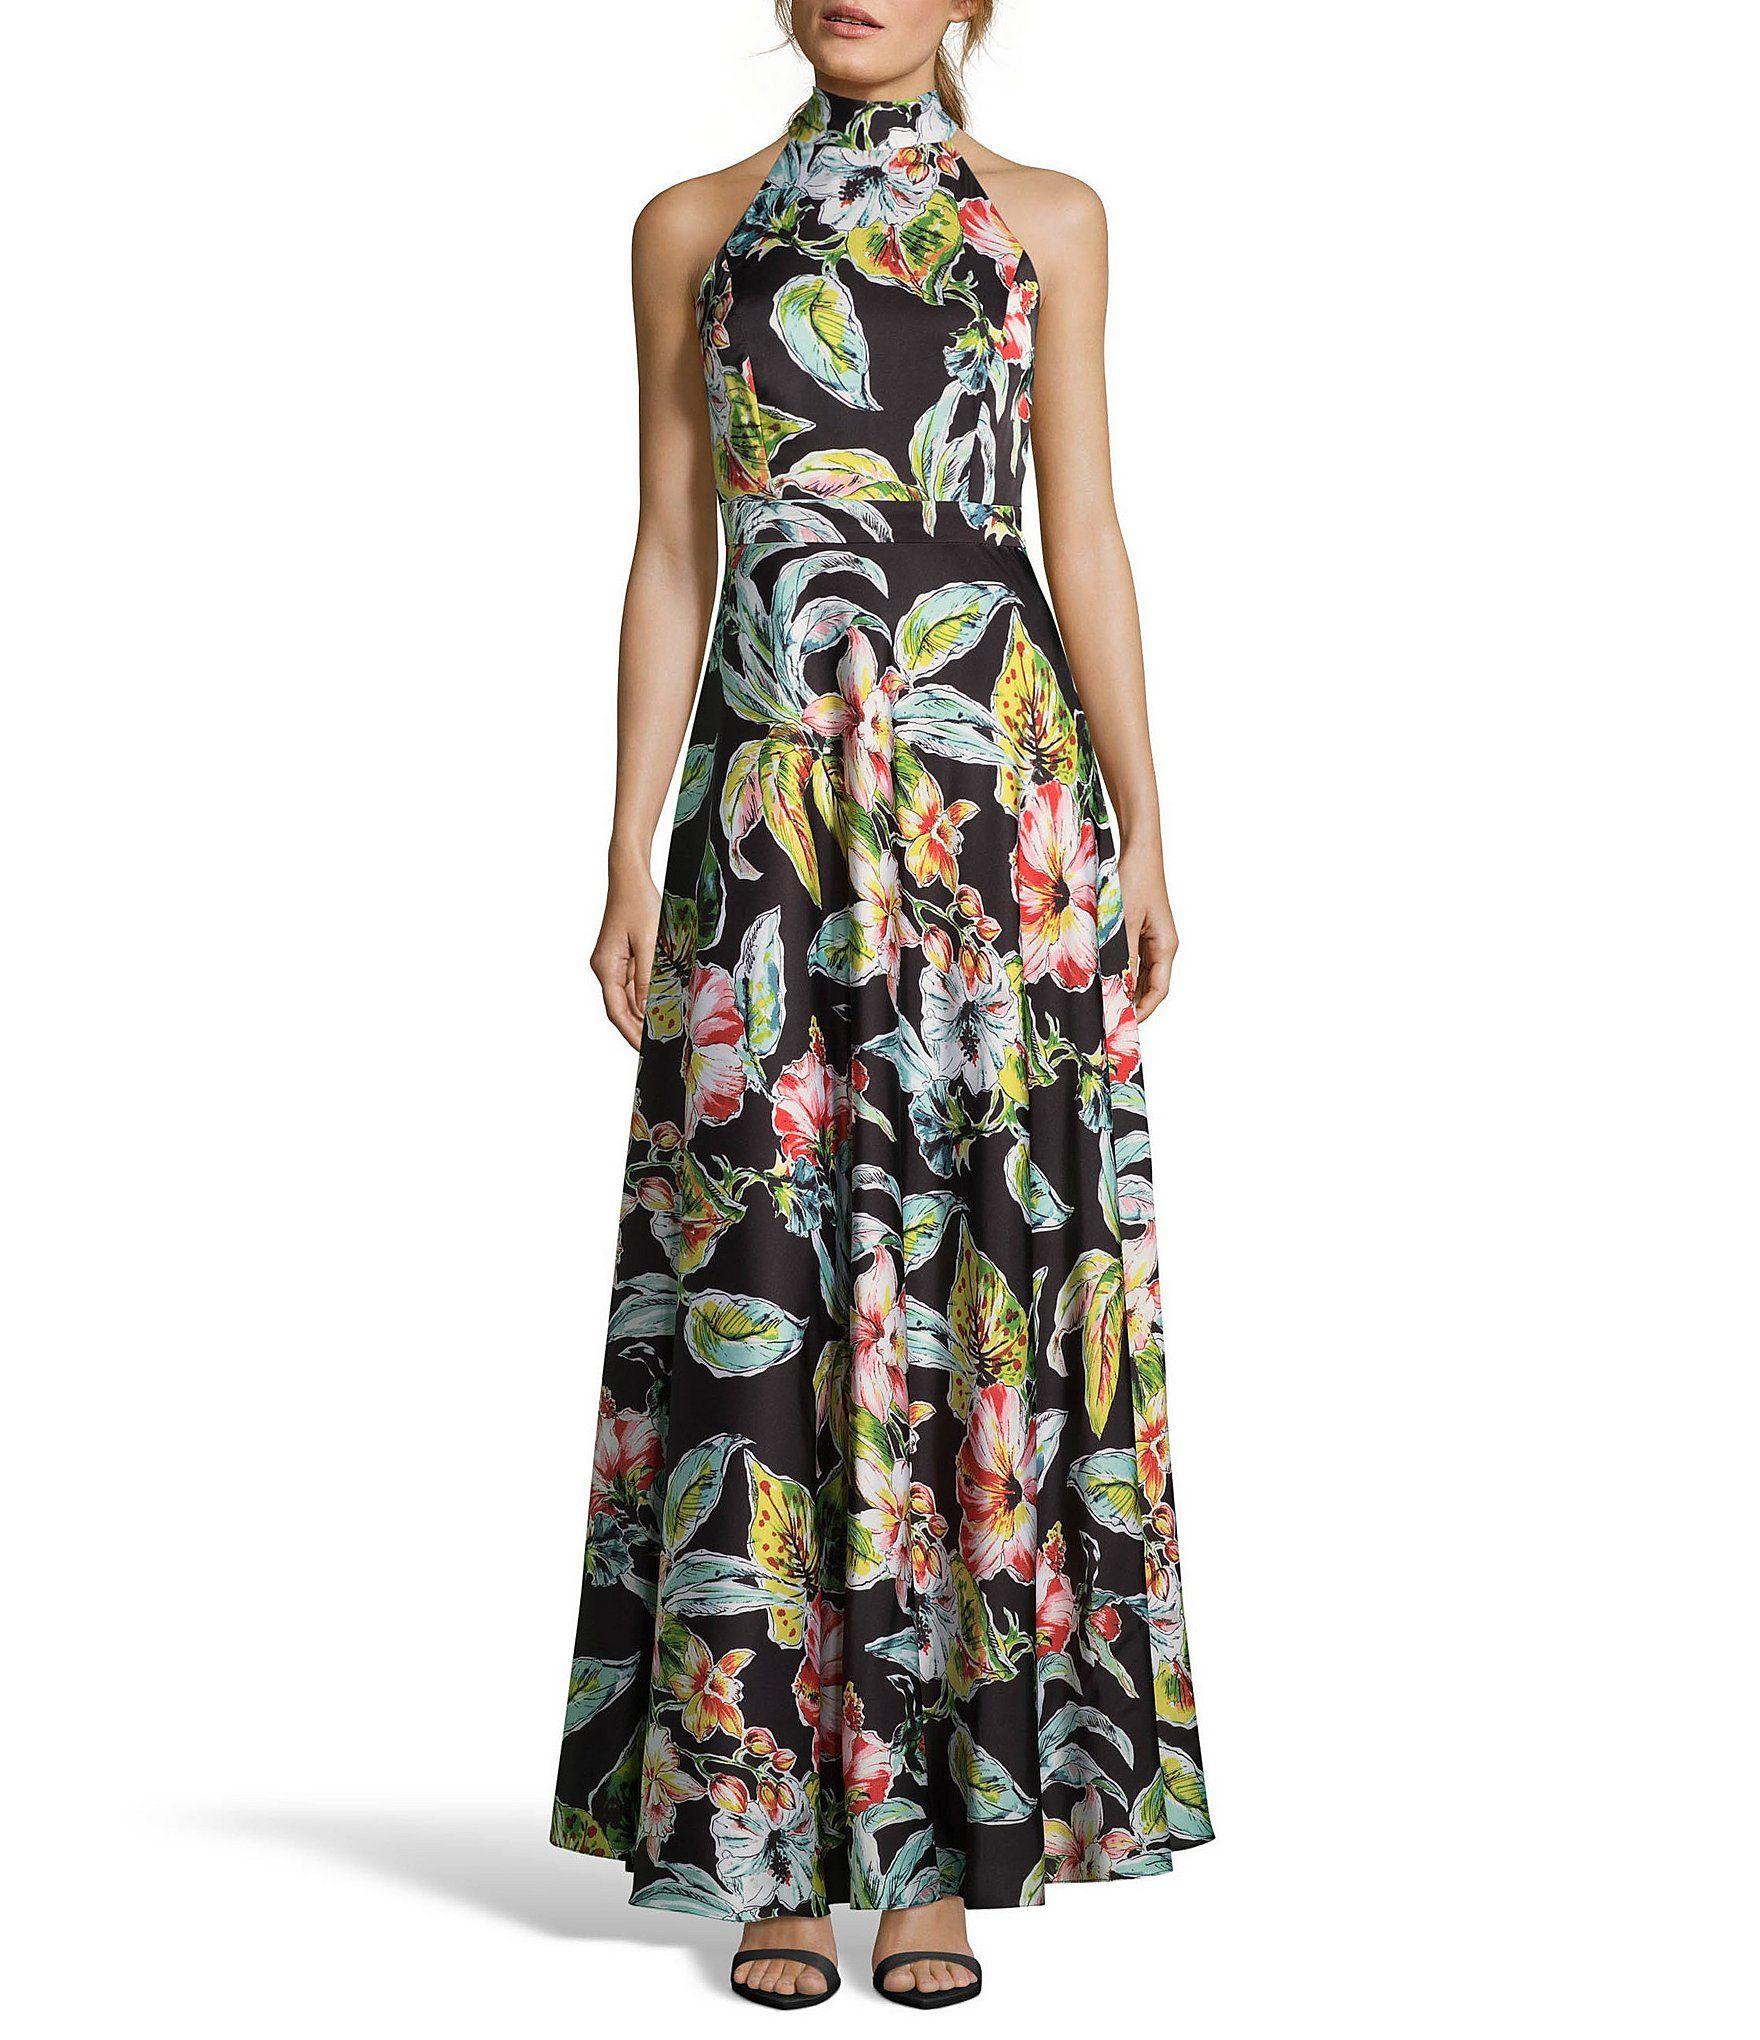 2dc023cef83 Shop for Nicole Miller New York Floral Print Halter Gown at Dillards.com.  Visit Dillards.com to find clothing